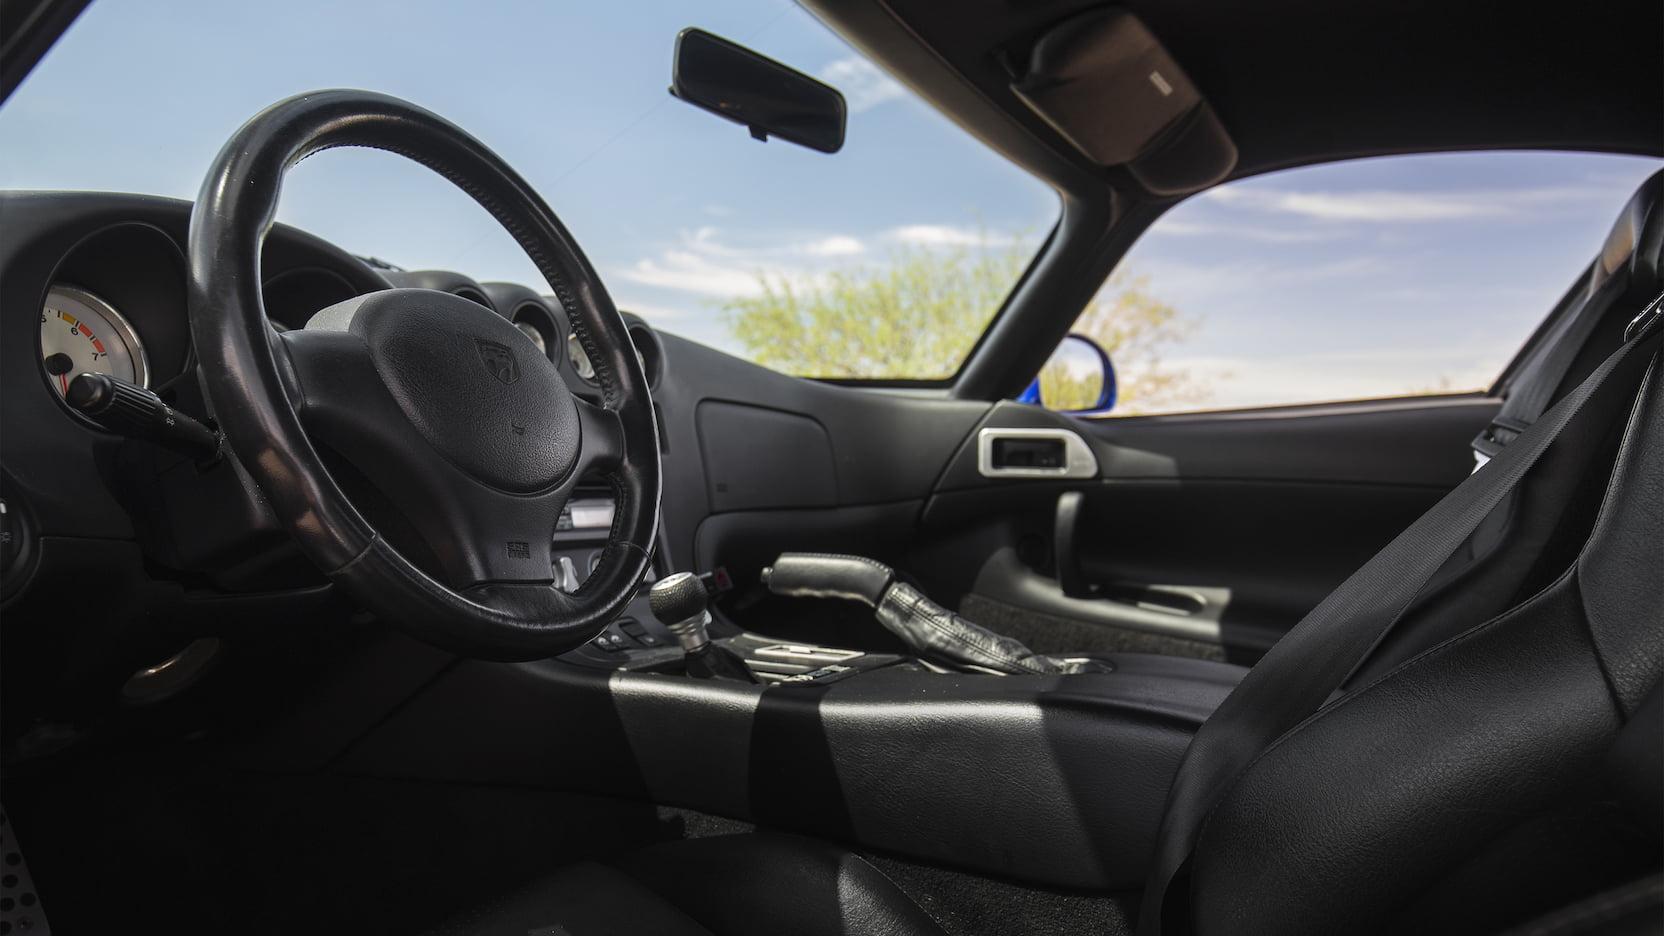 1996 Dodge Viper GTS interior steering low